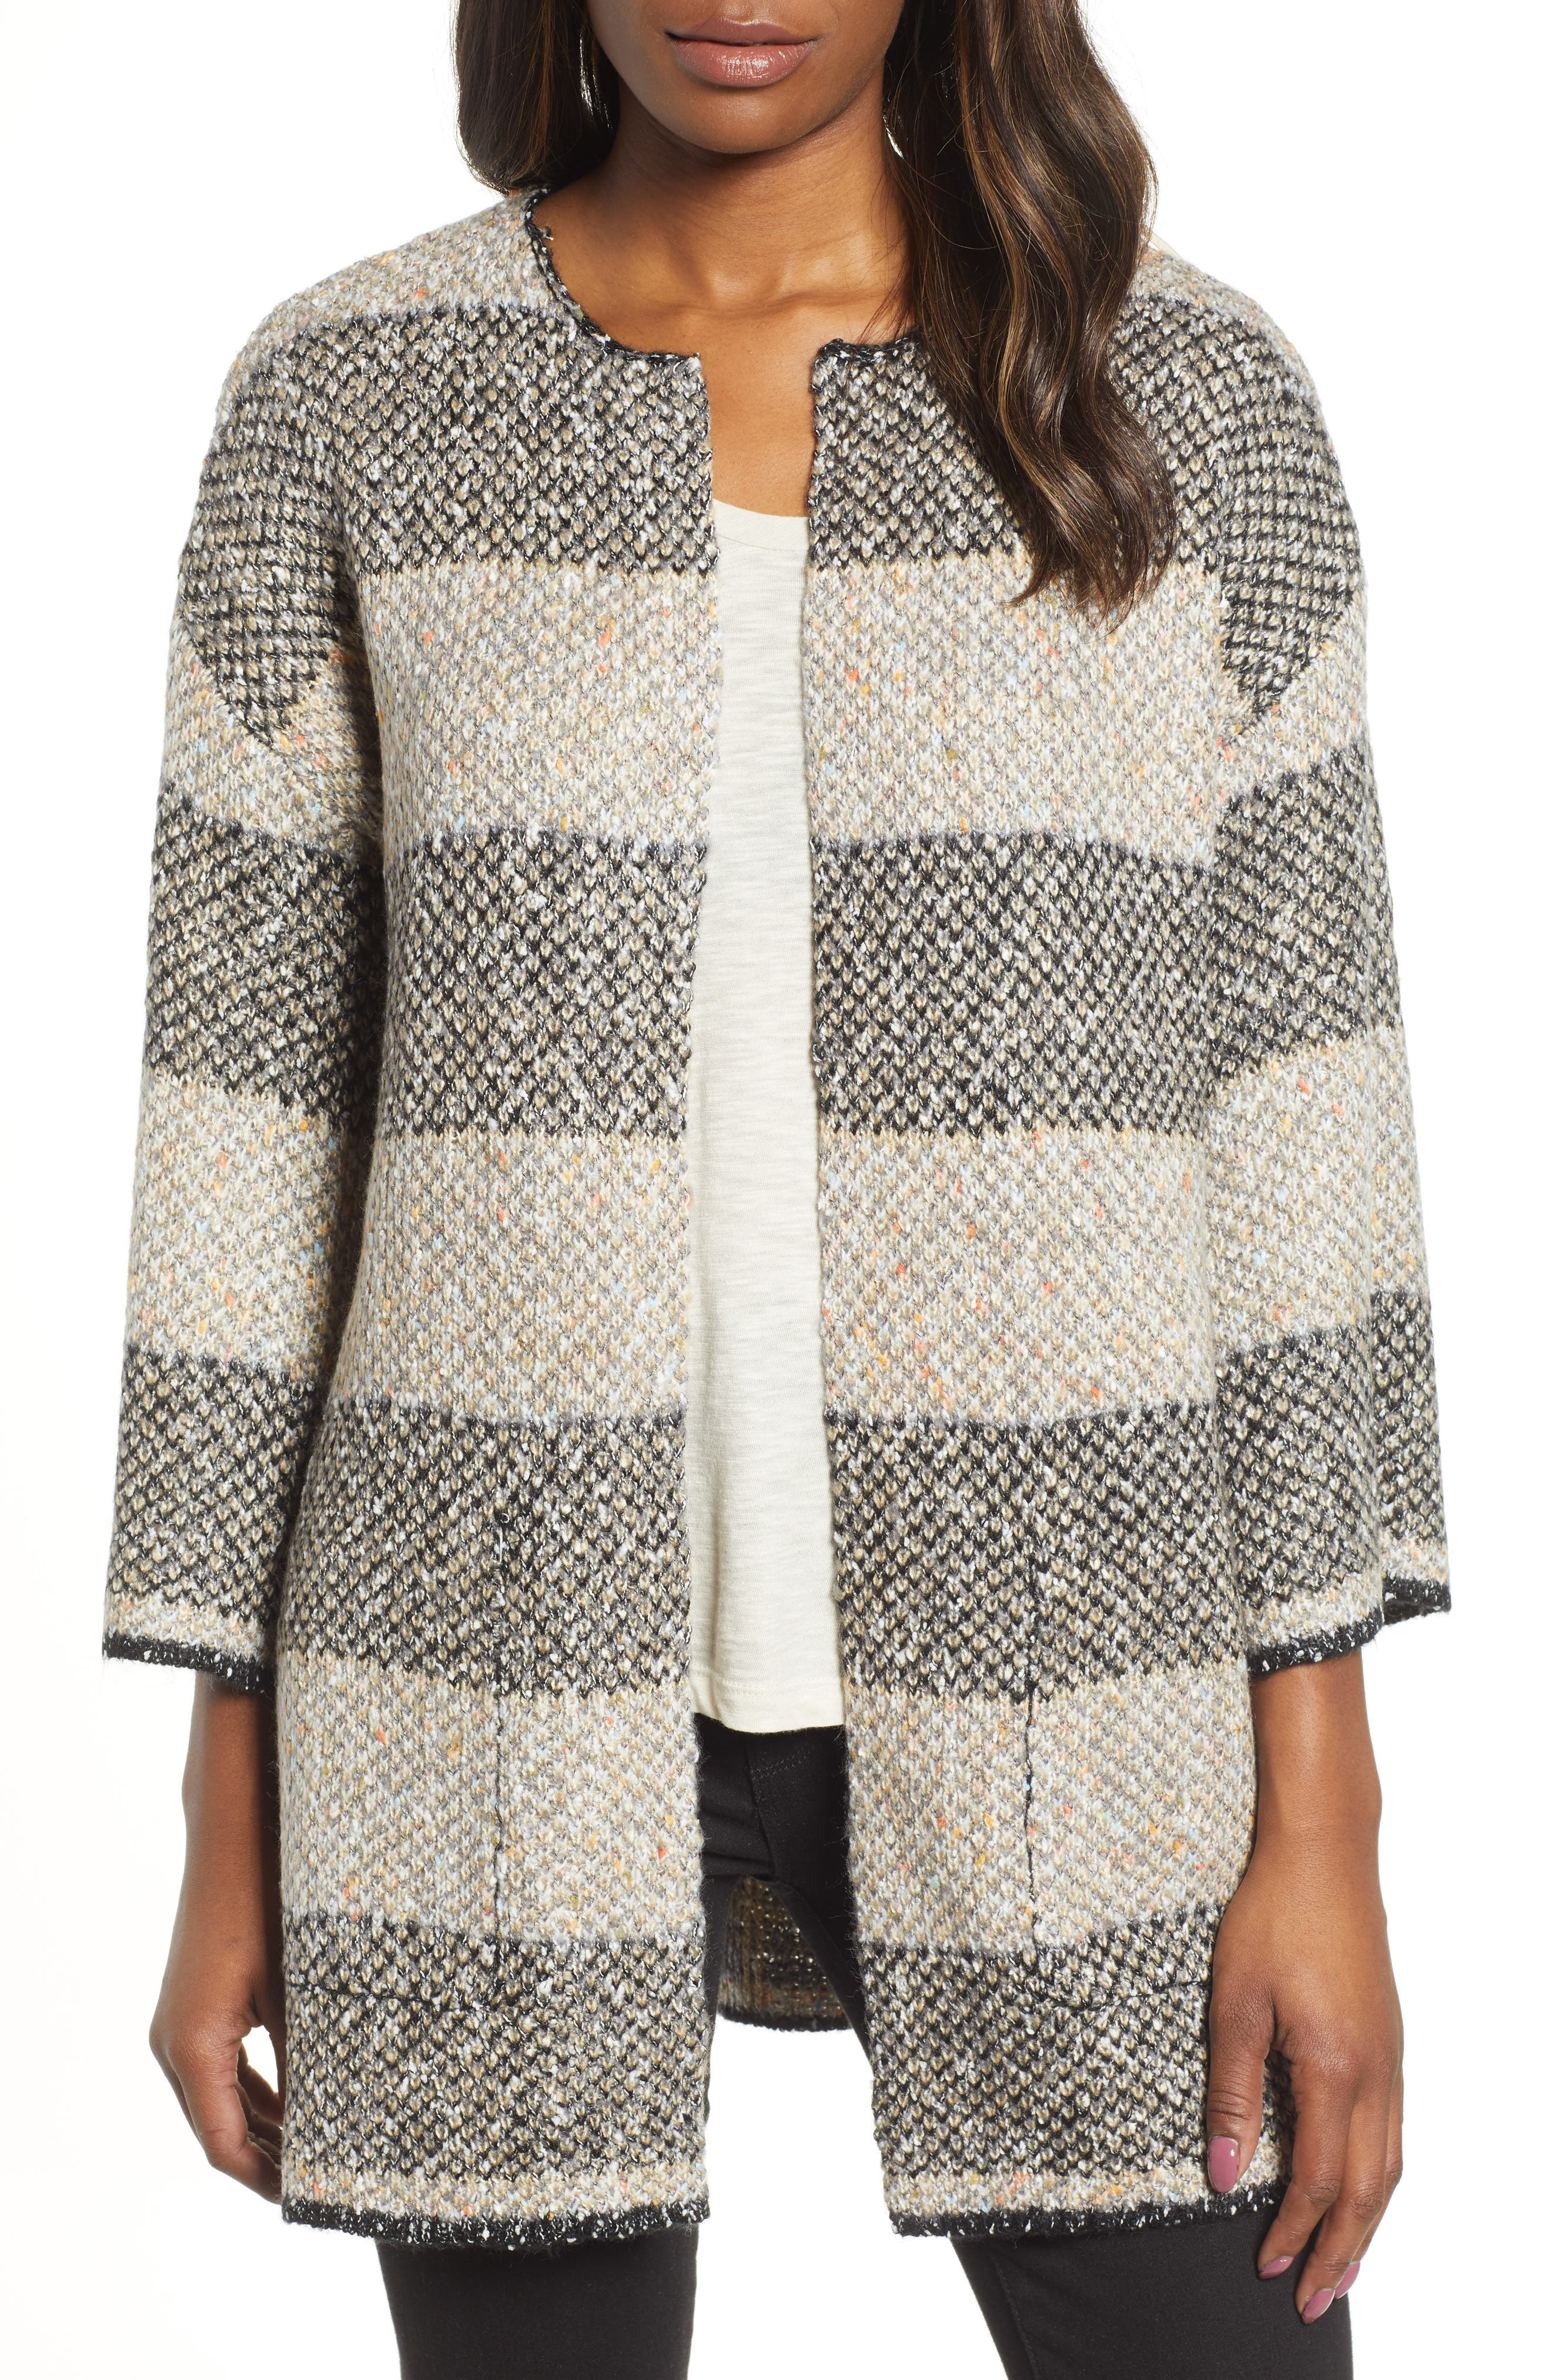 Reversible Plaid Jacquard Sweater Jacket,                             Alternate thumbnail 2, color,                             GREY